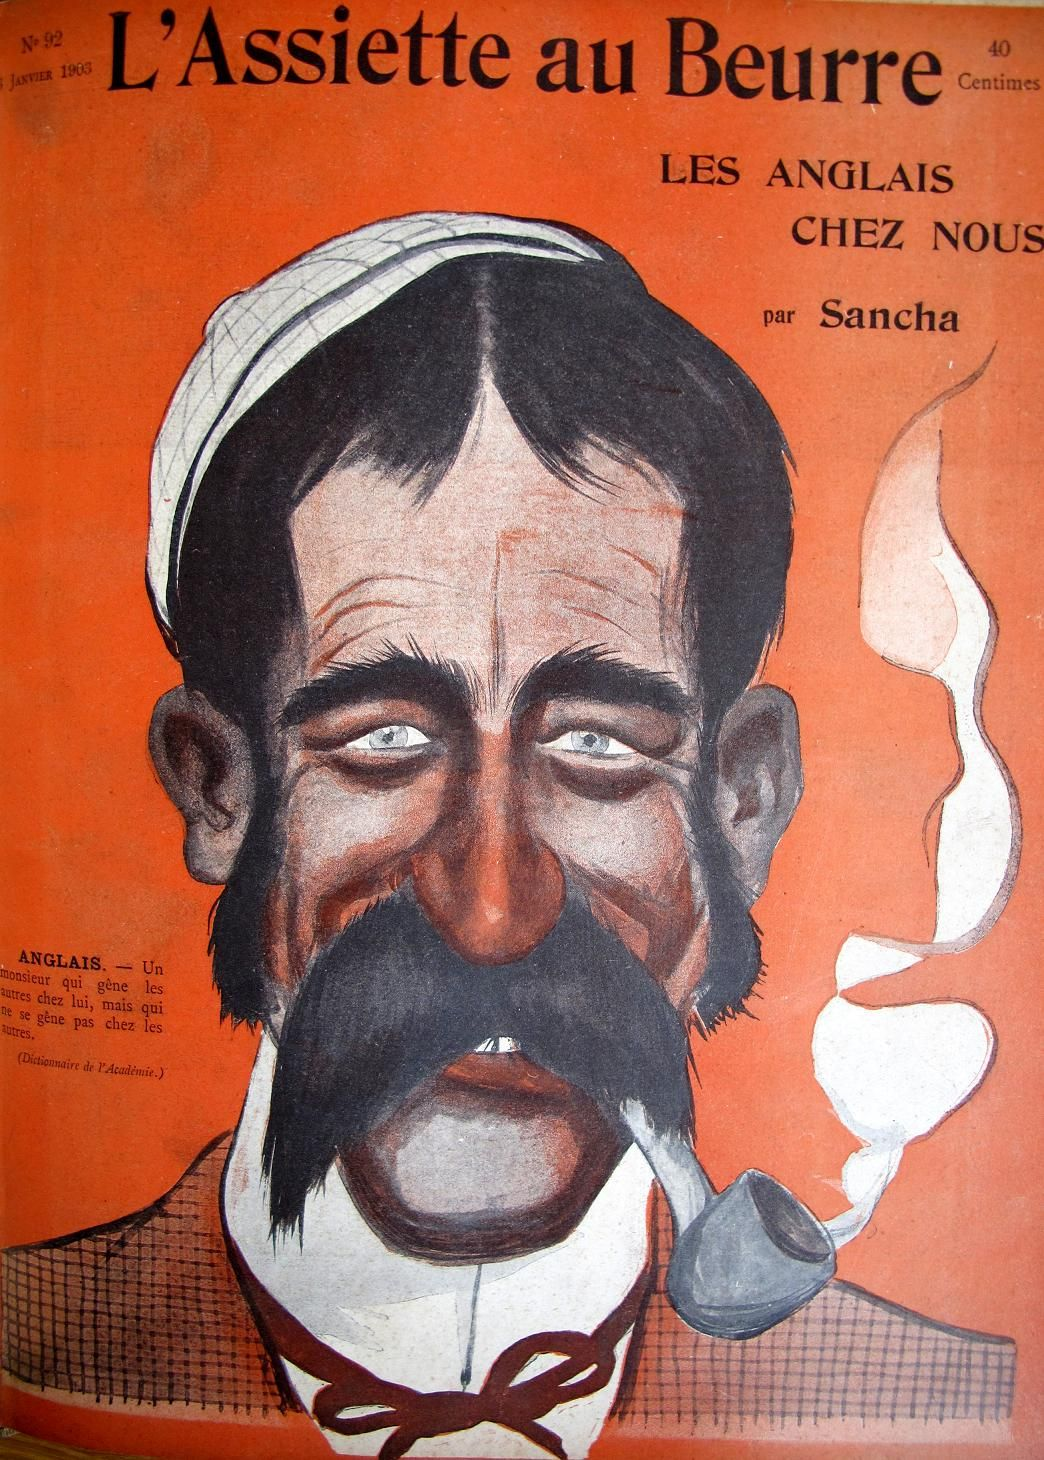 UTL caricatures anglaises lassiette au beurre 1903.jpg